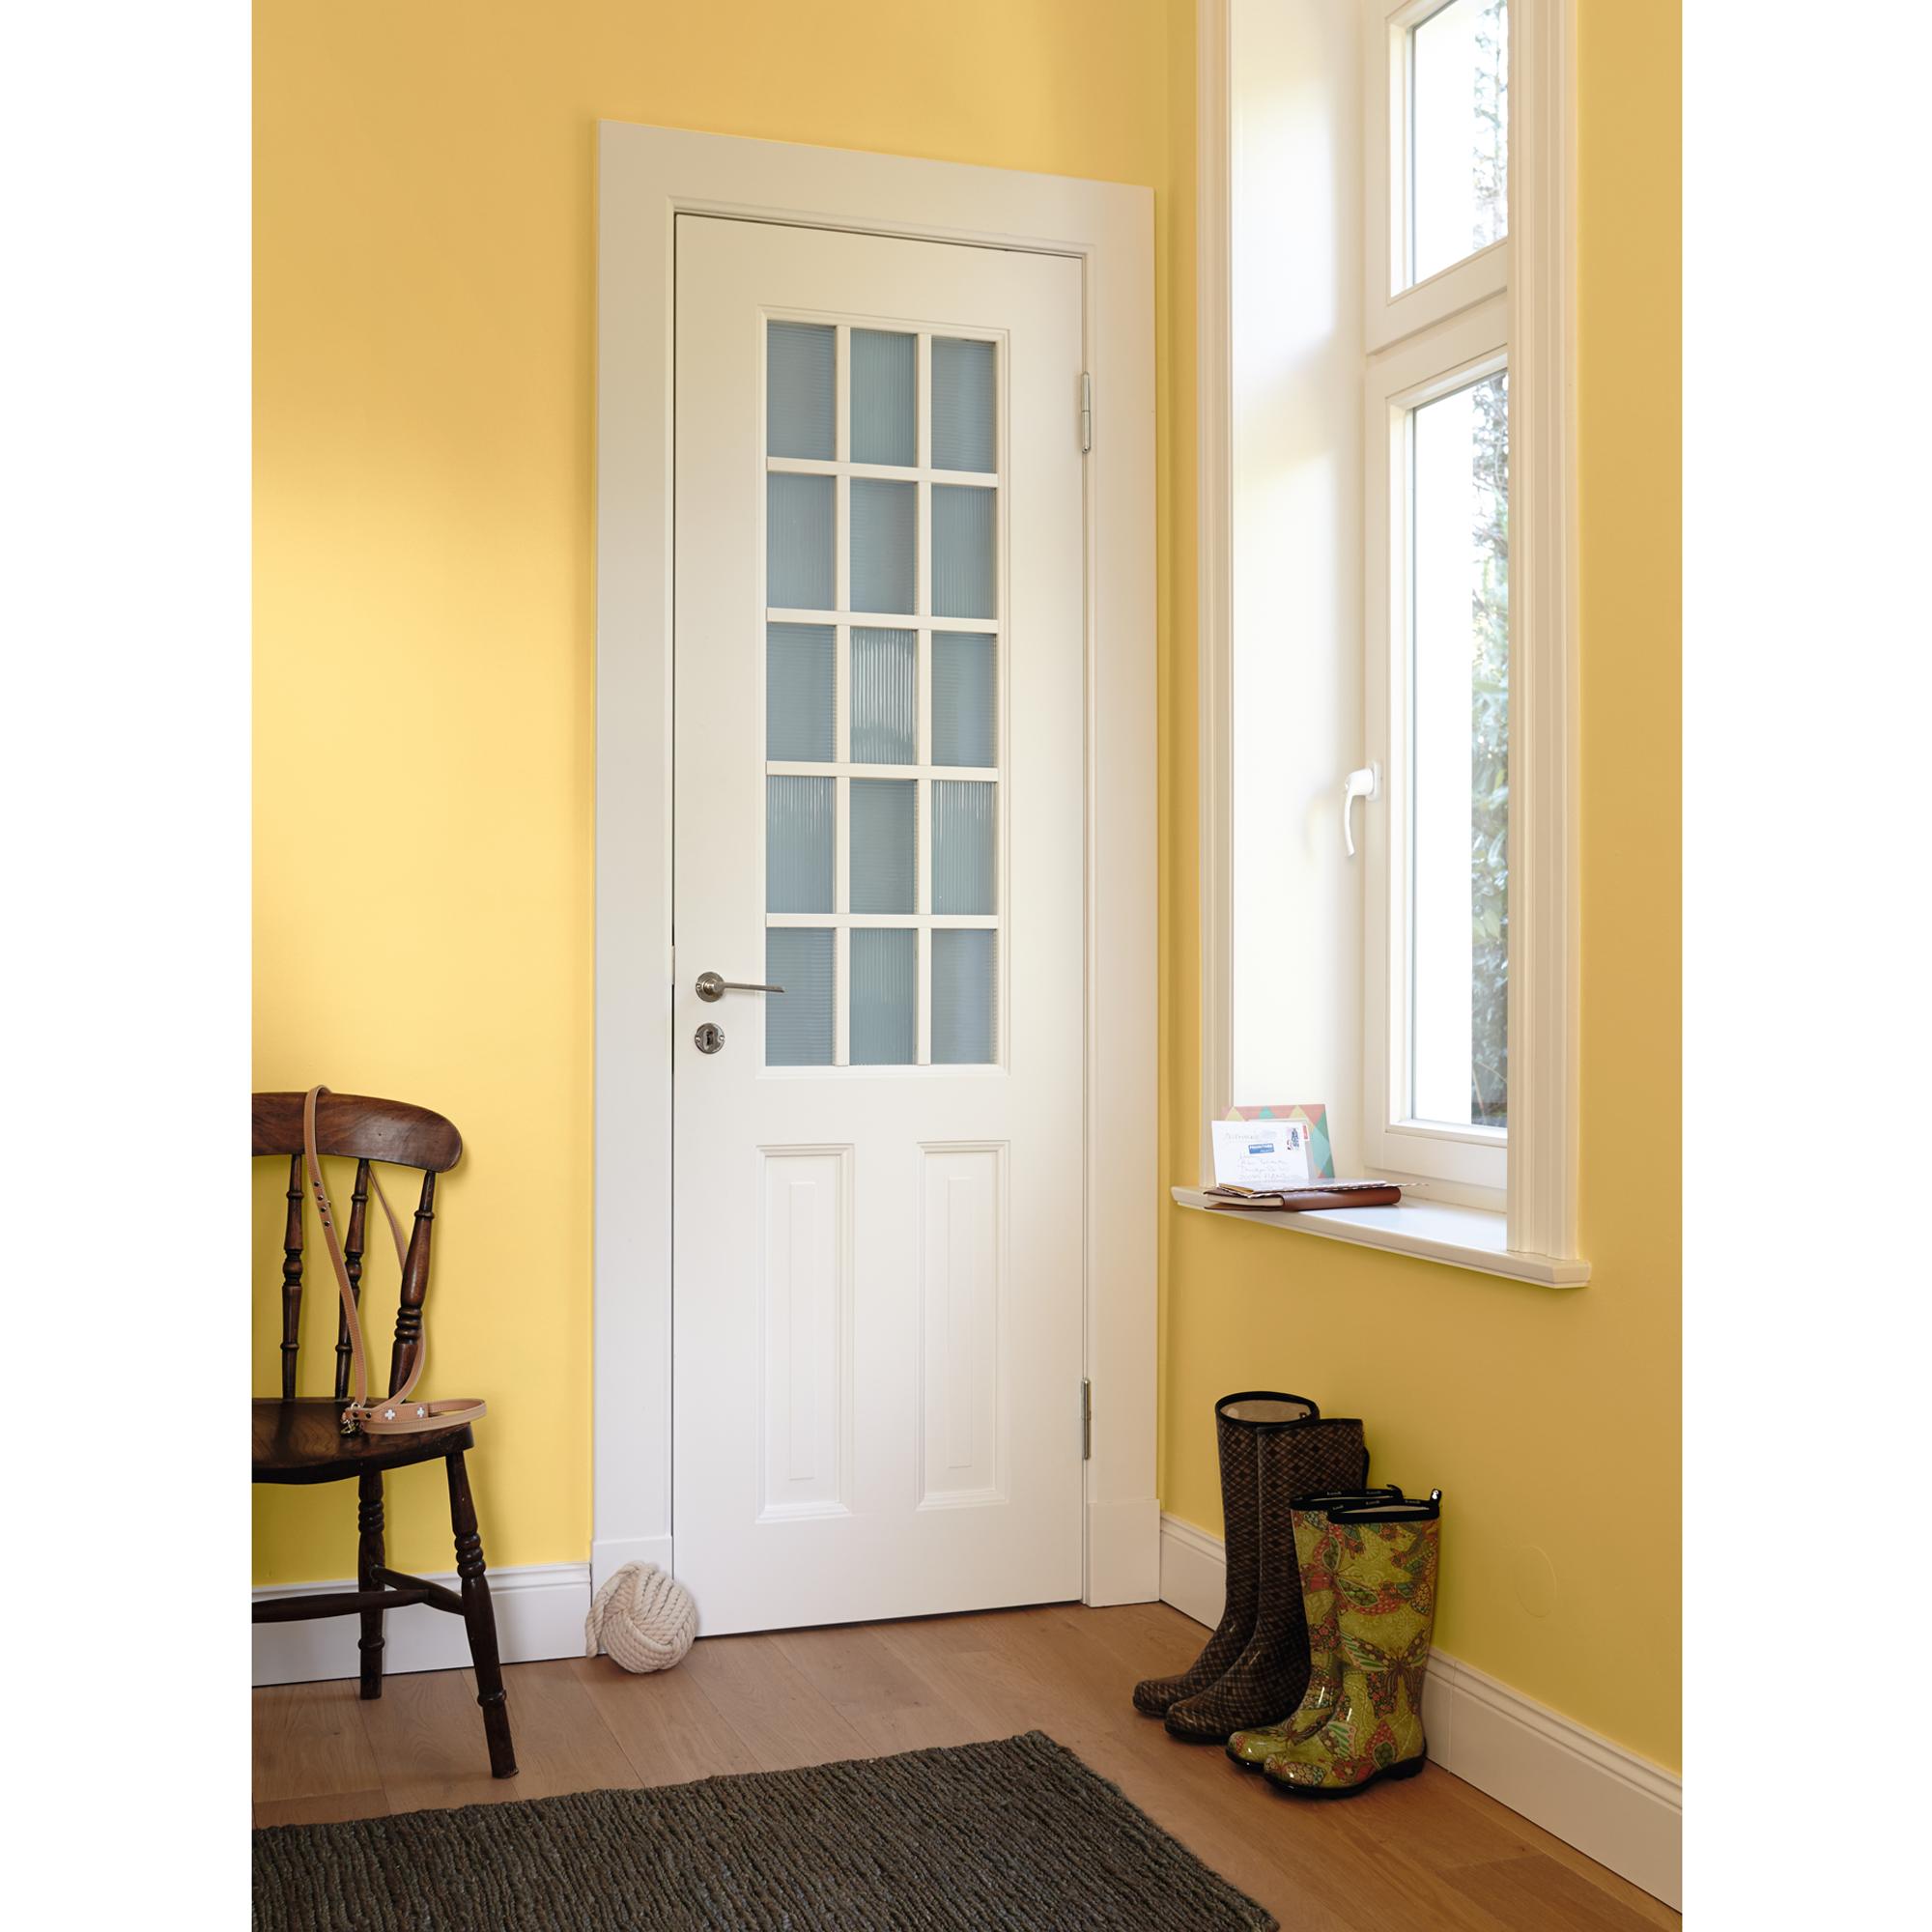 toom wandfarbe beige fliesen welche wandfarbe with toom. Black Bedroom Furniture Sets. Home Design Ideas